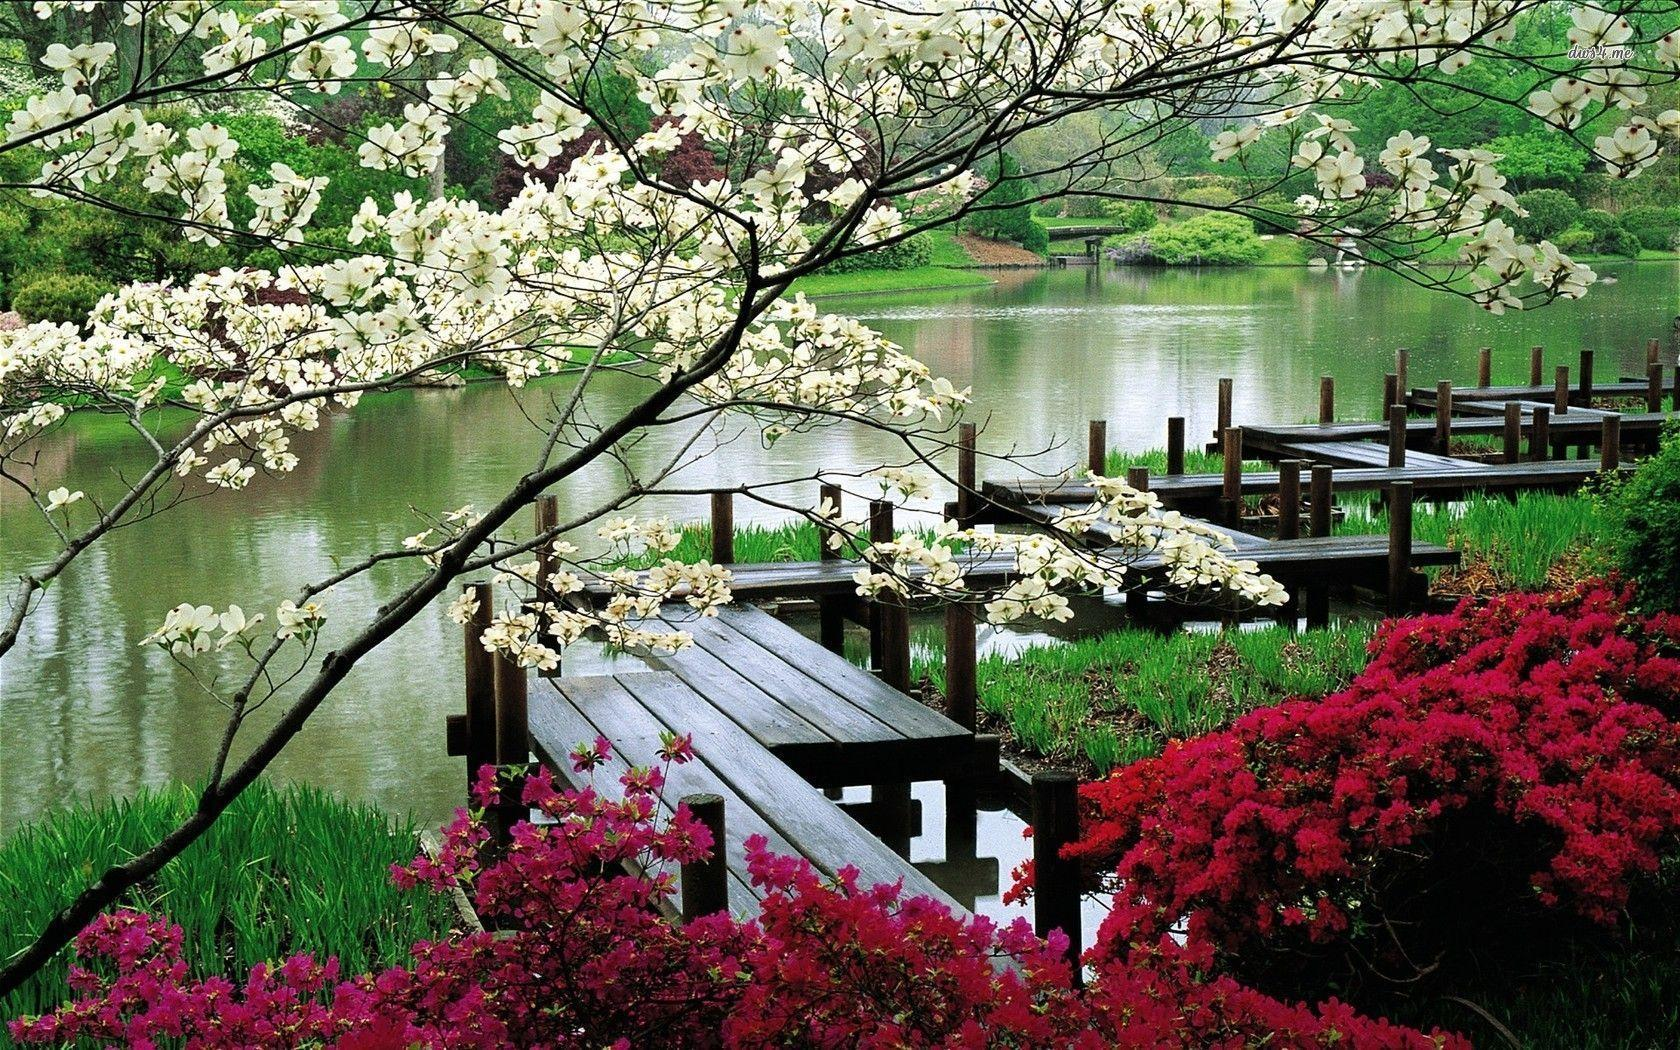 Japanese garden wallpaper - Nature wallpapers - #